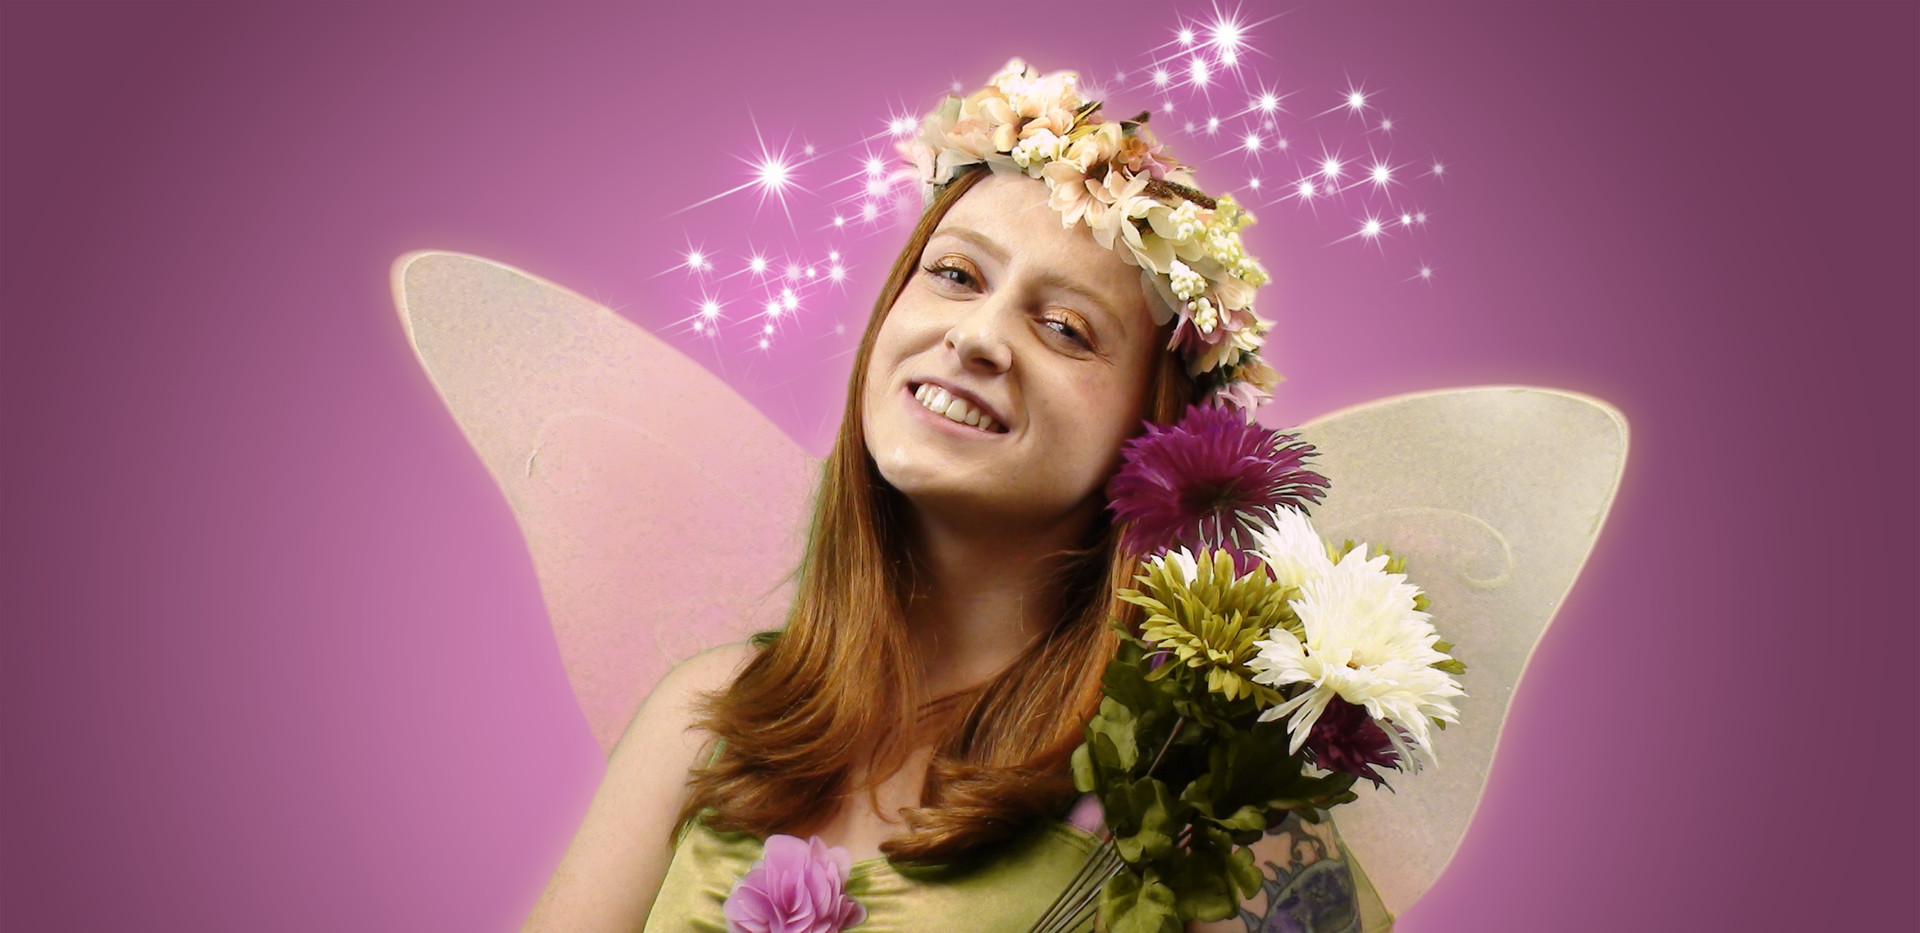 fairy_tess3.jpg